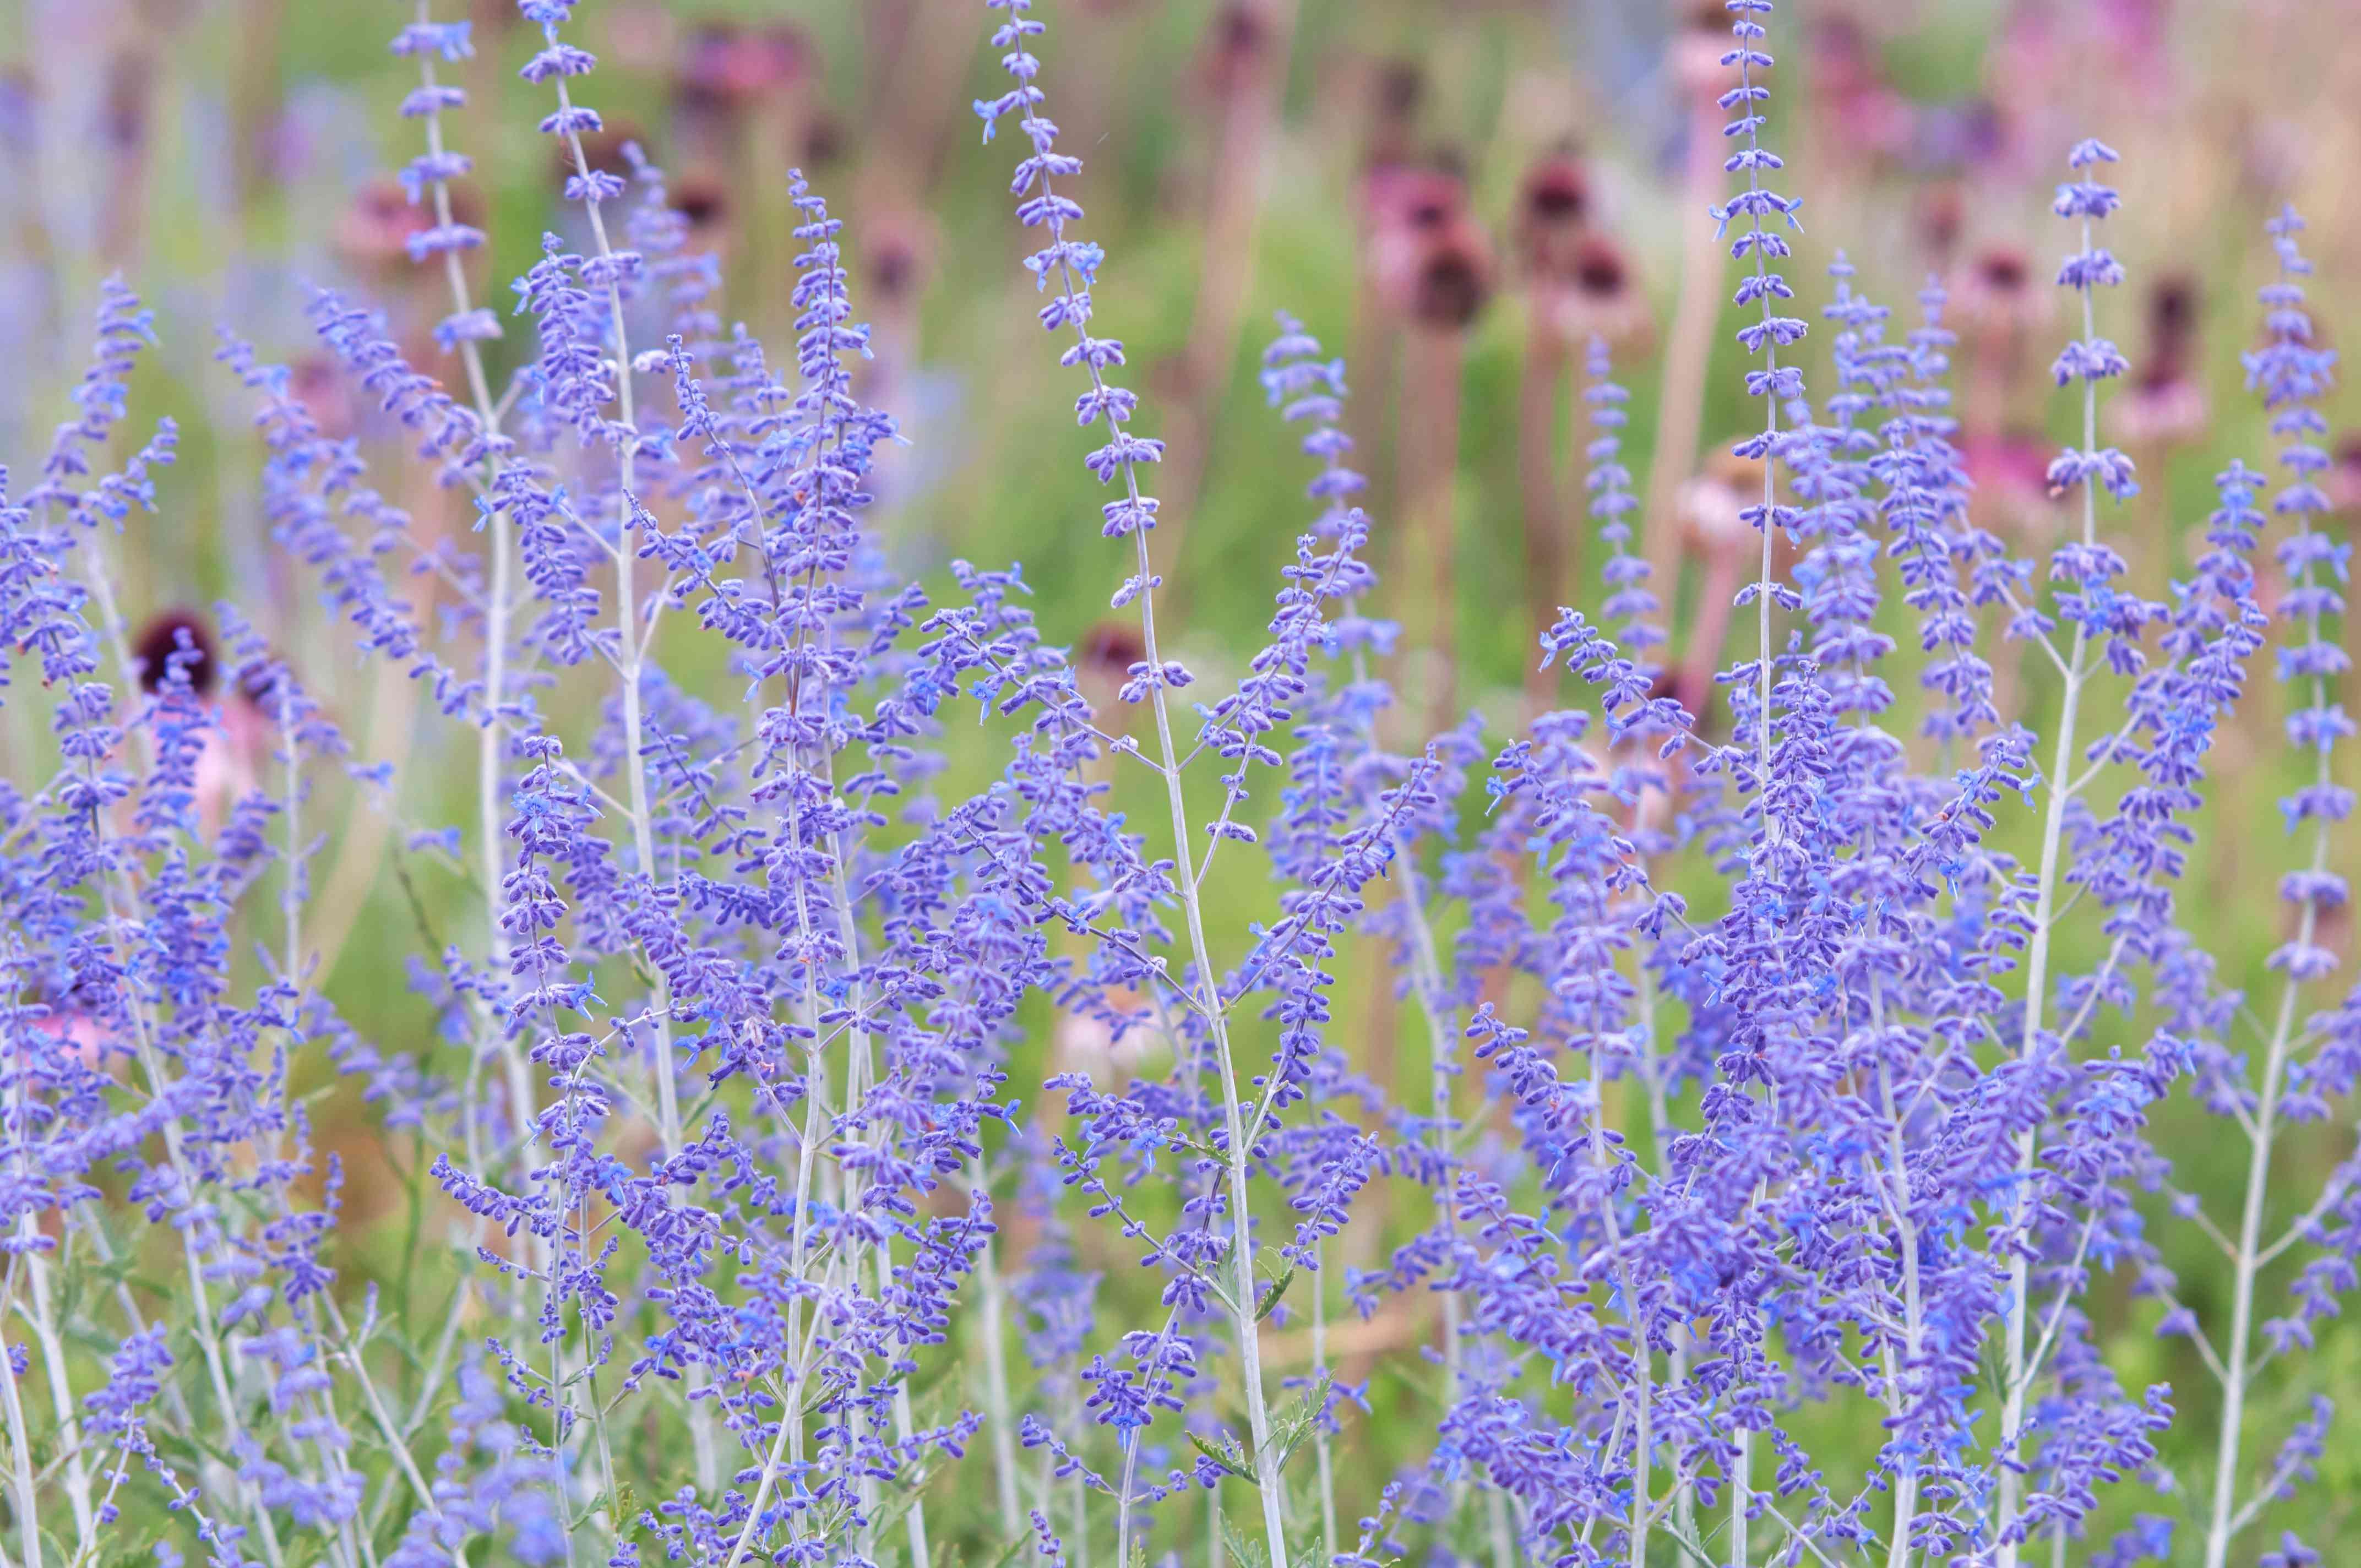 Russian sage with purple flowers in garden